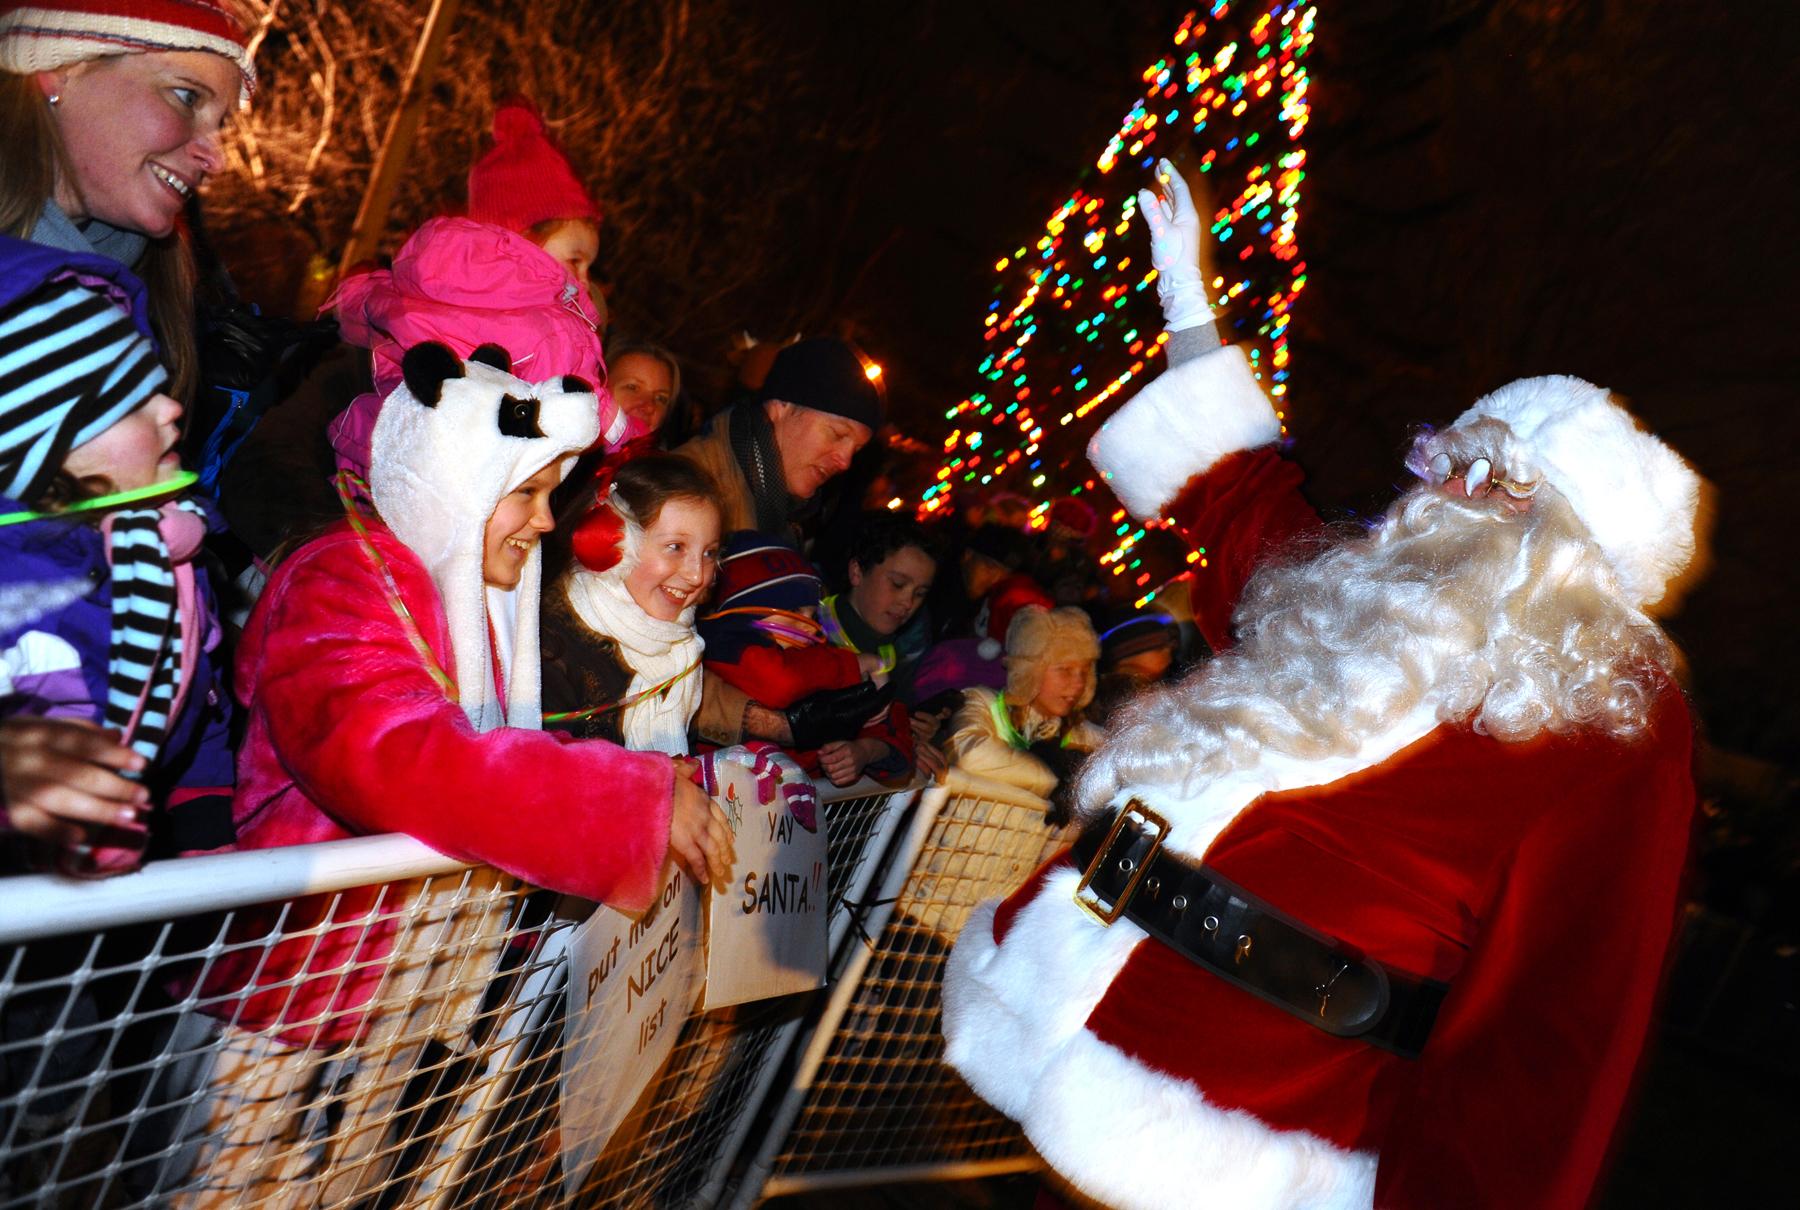 O, Christmas Tree! Crowd Heralds Bright Start To Season